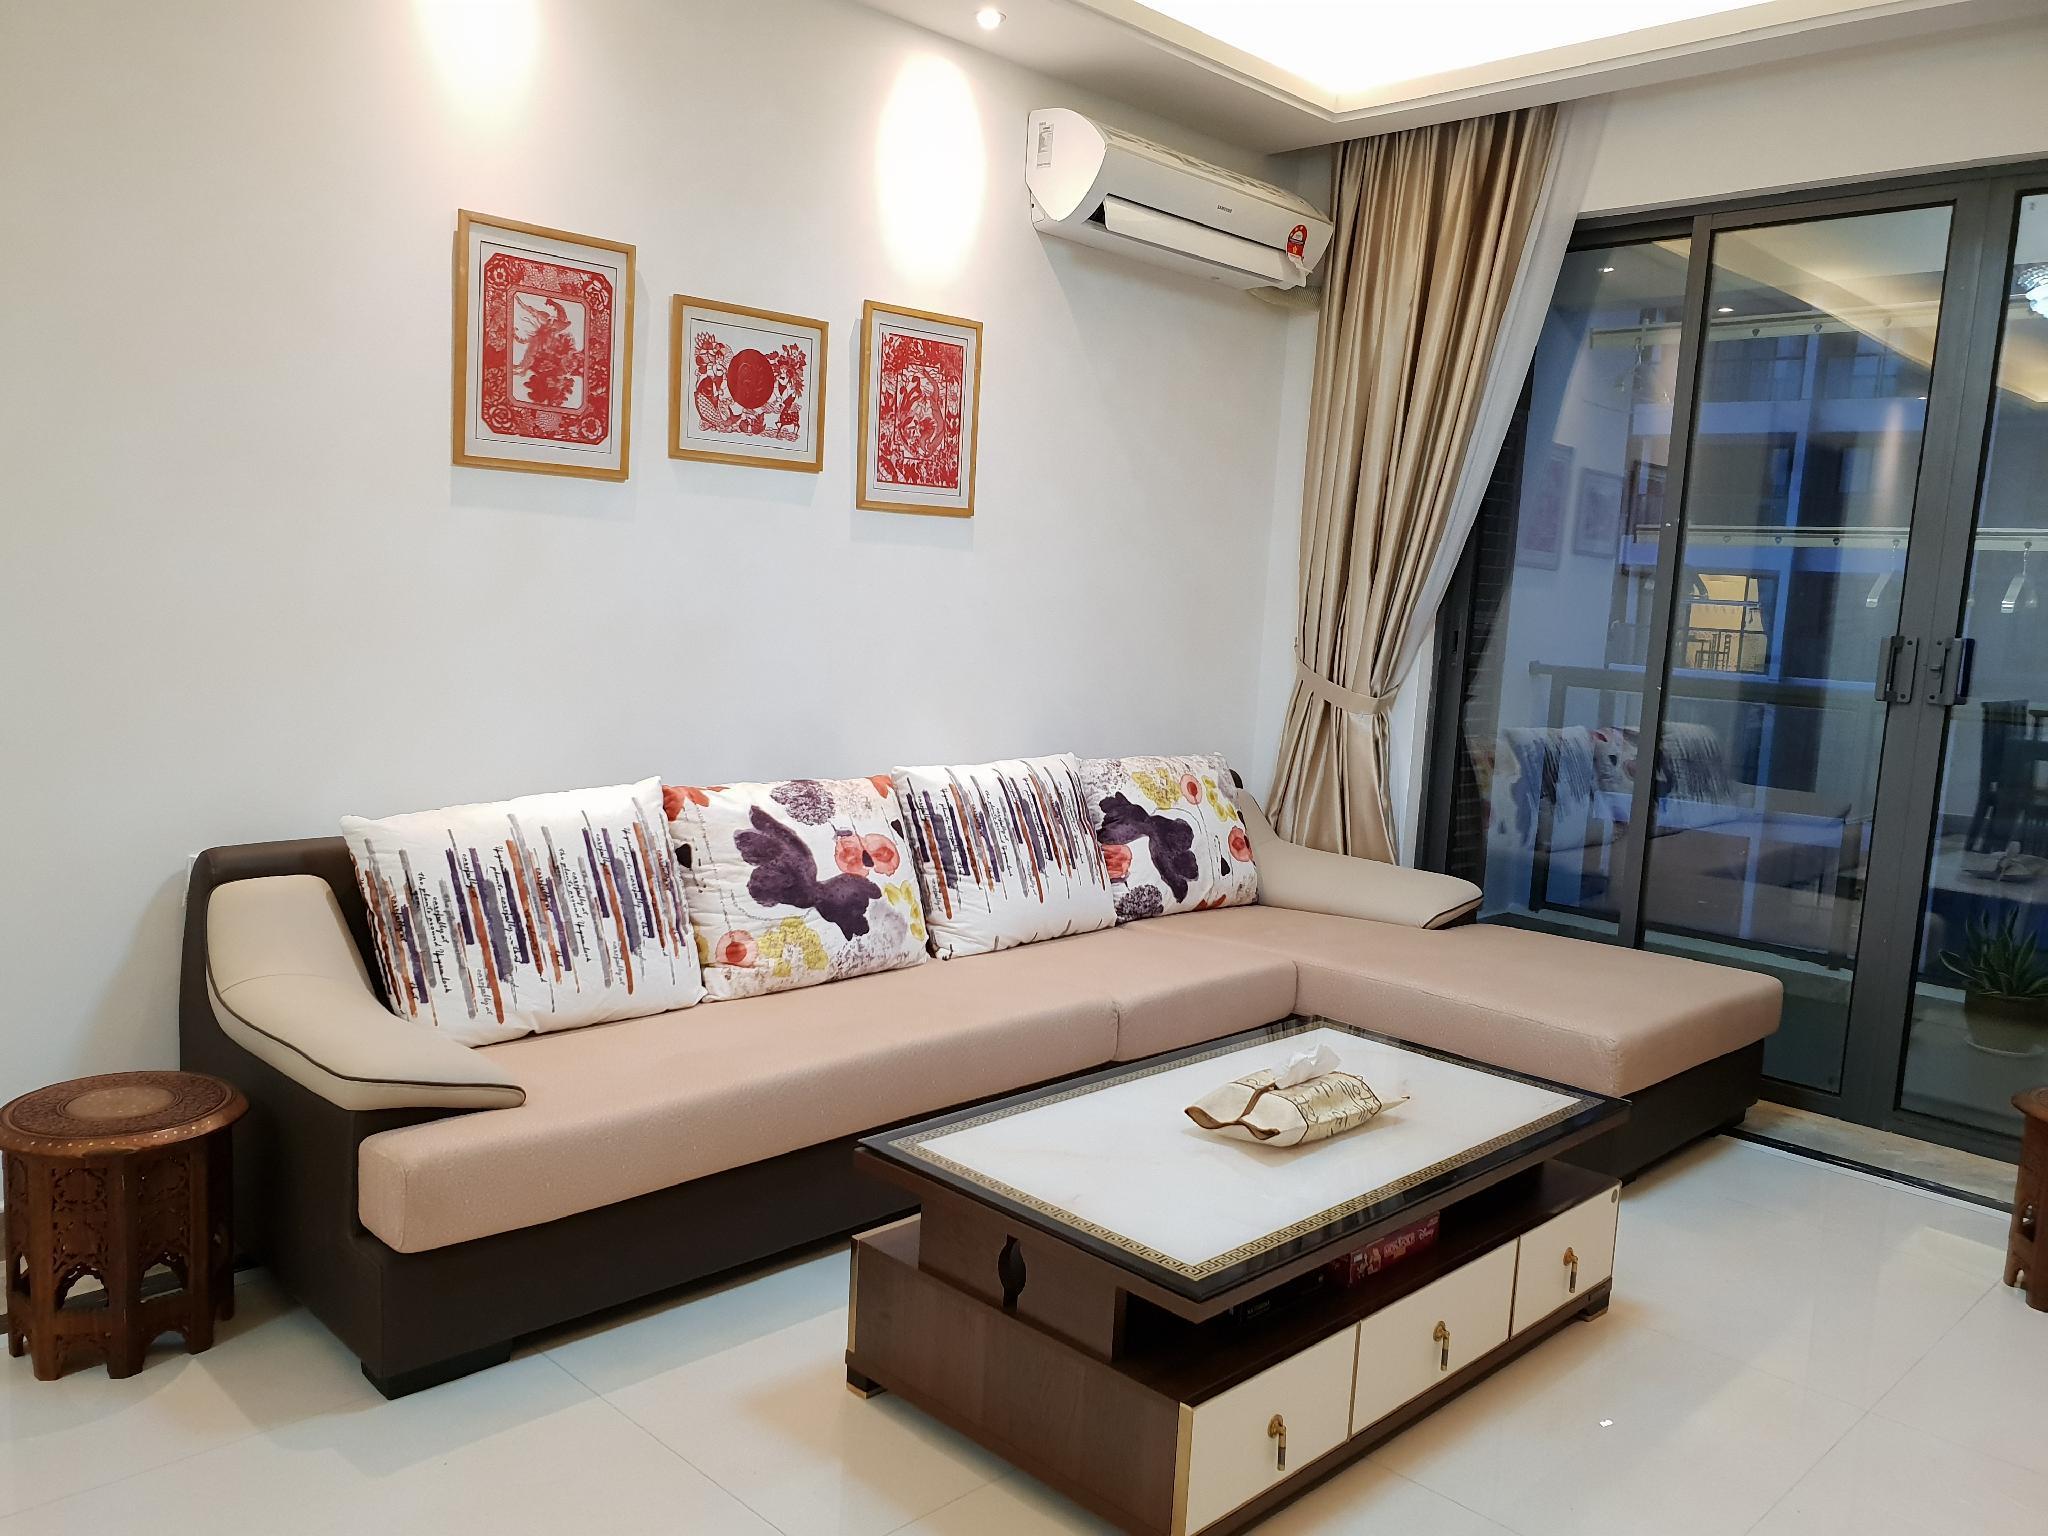 Oriental@R&F Princess Cove Johor CIQ 6 8 Pax